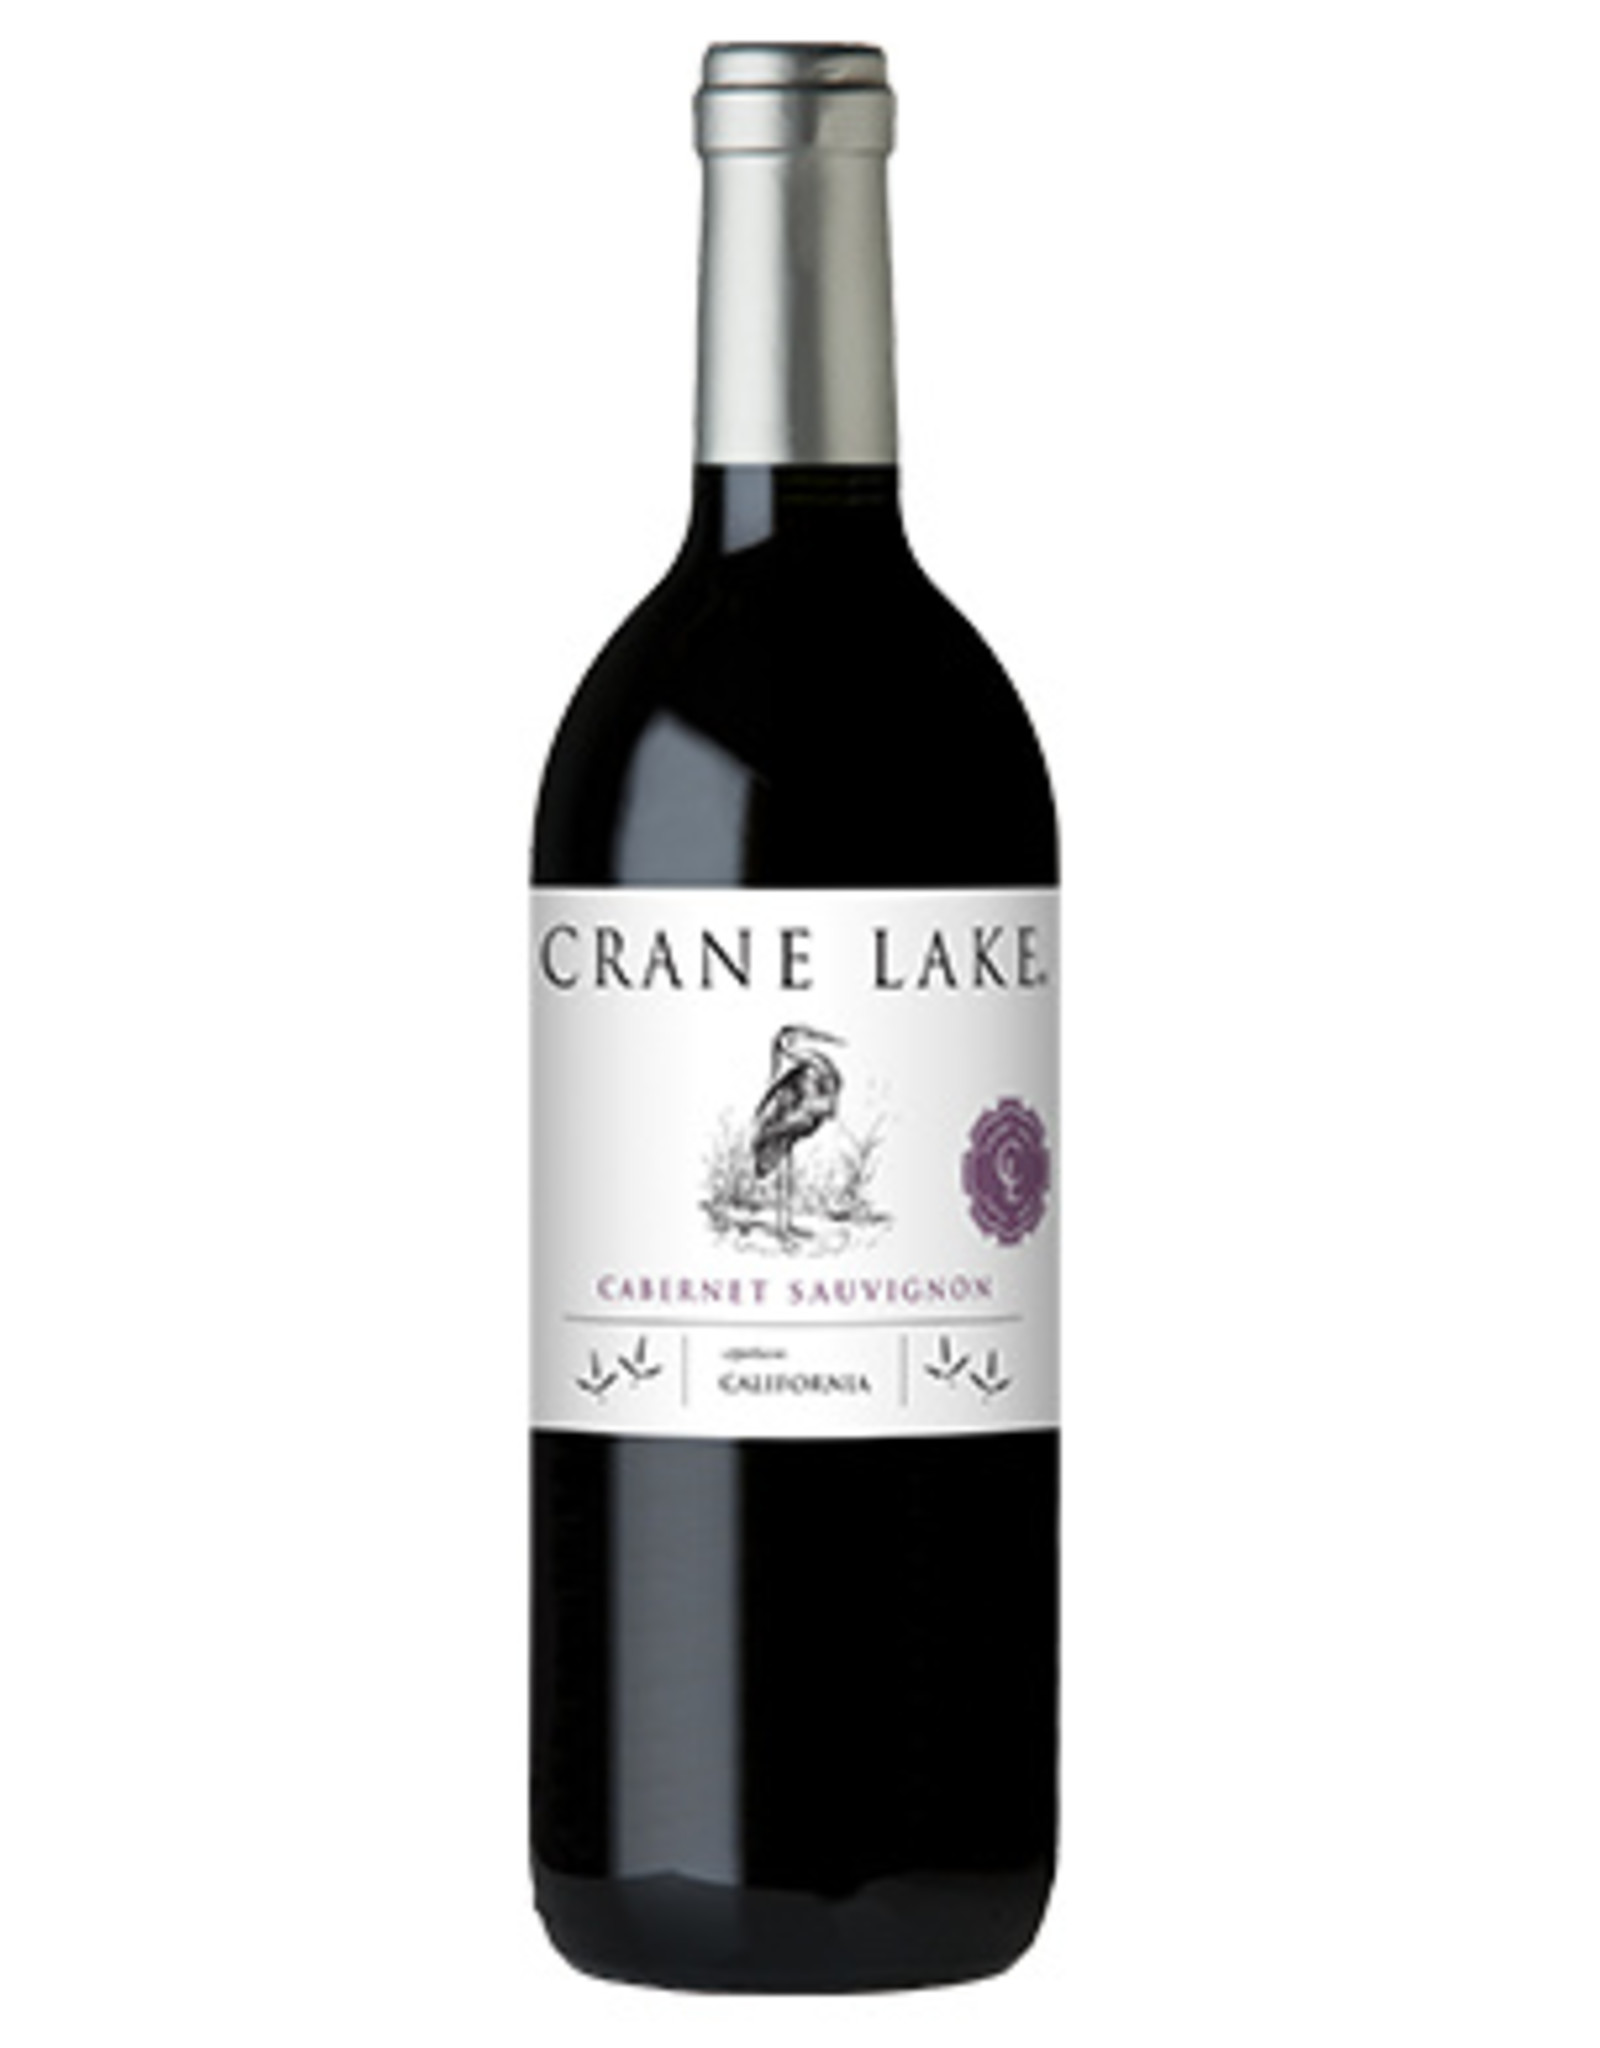 Crane Lake Crane Lake Cabernet Sauvignon